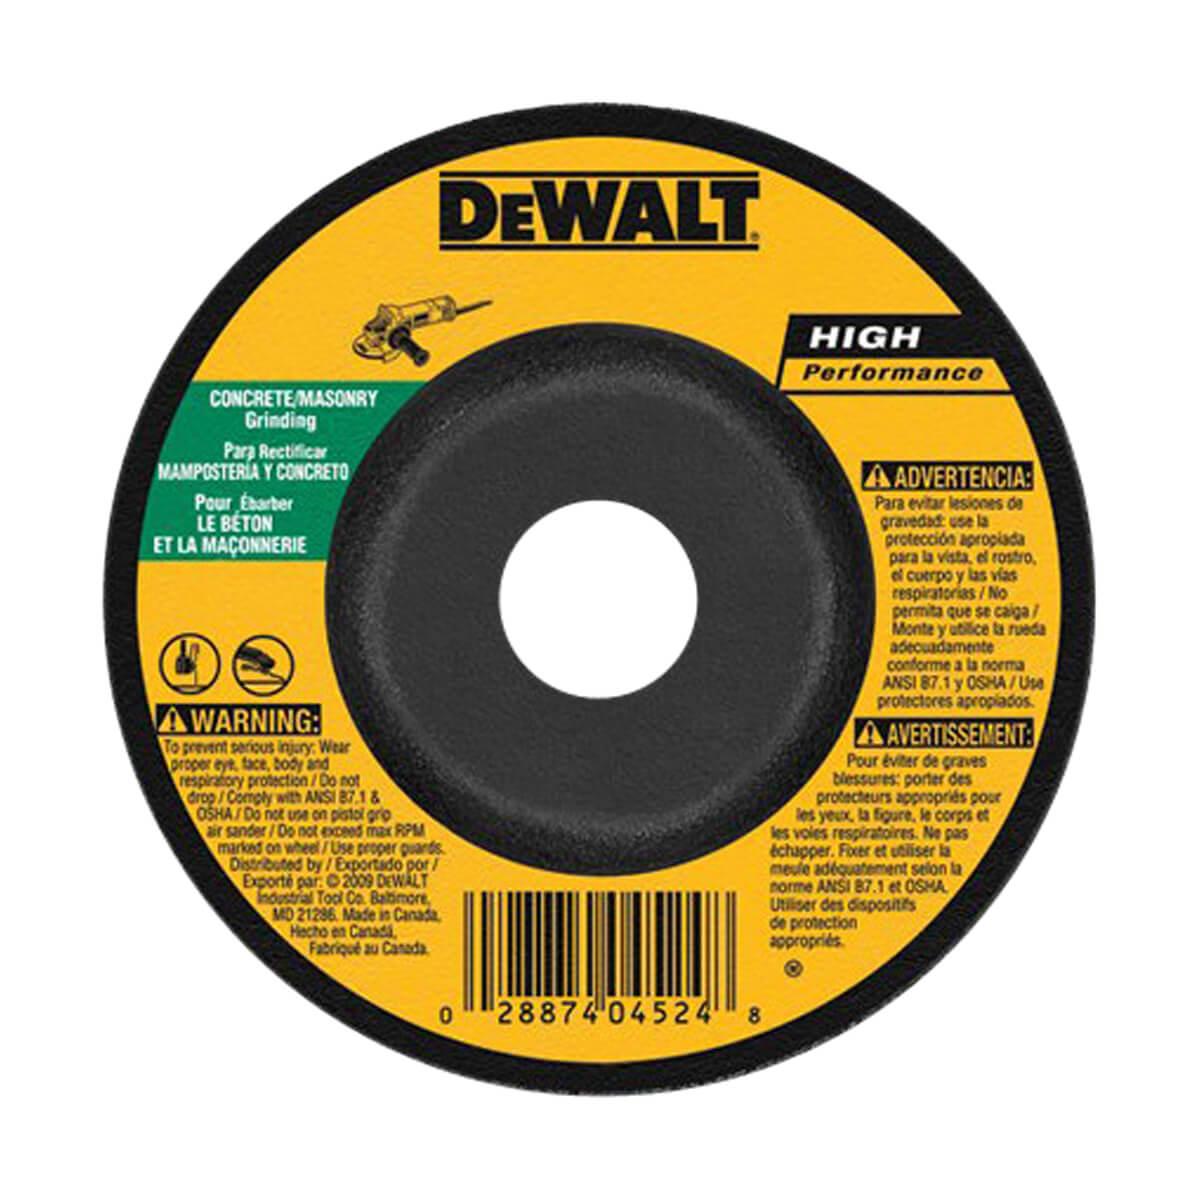 "DEWALT Concrete/Masonry Grinding Wheel - 5"" x 1/4"" x 7/8"""